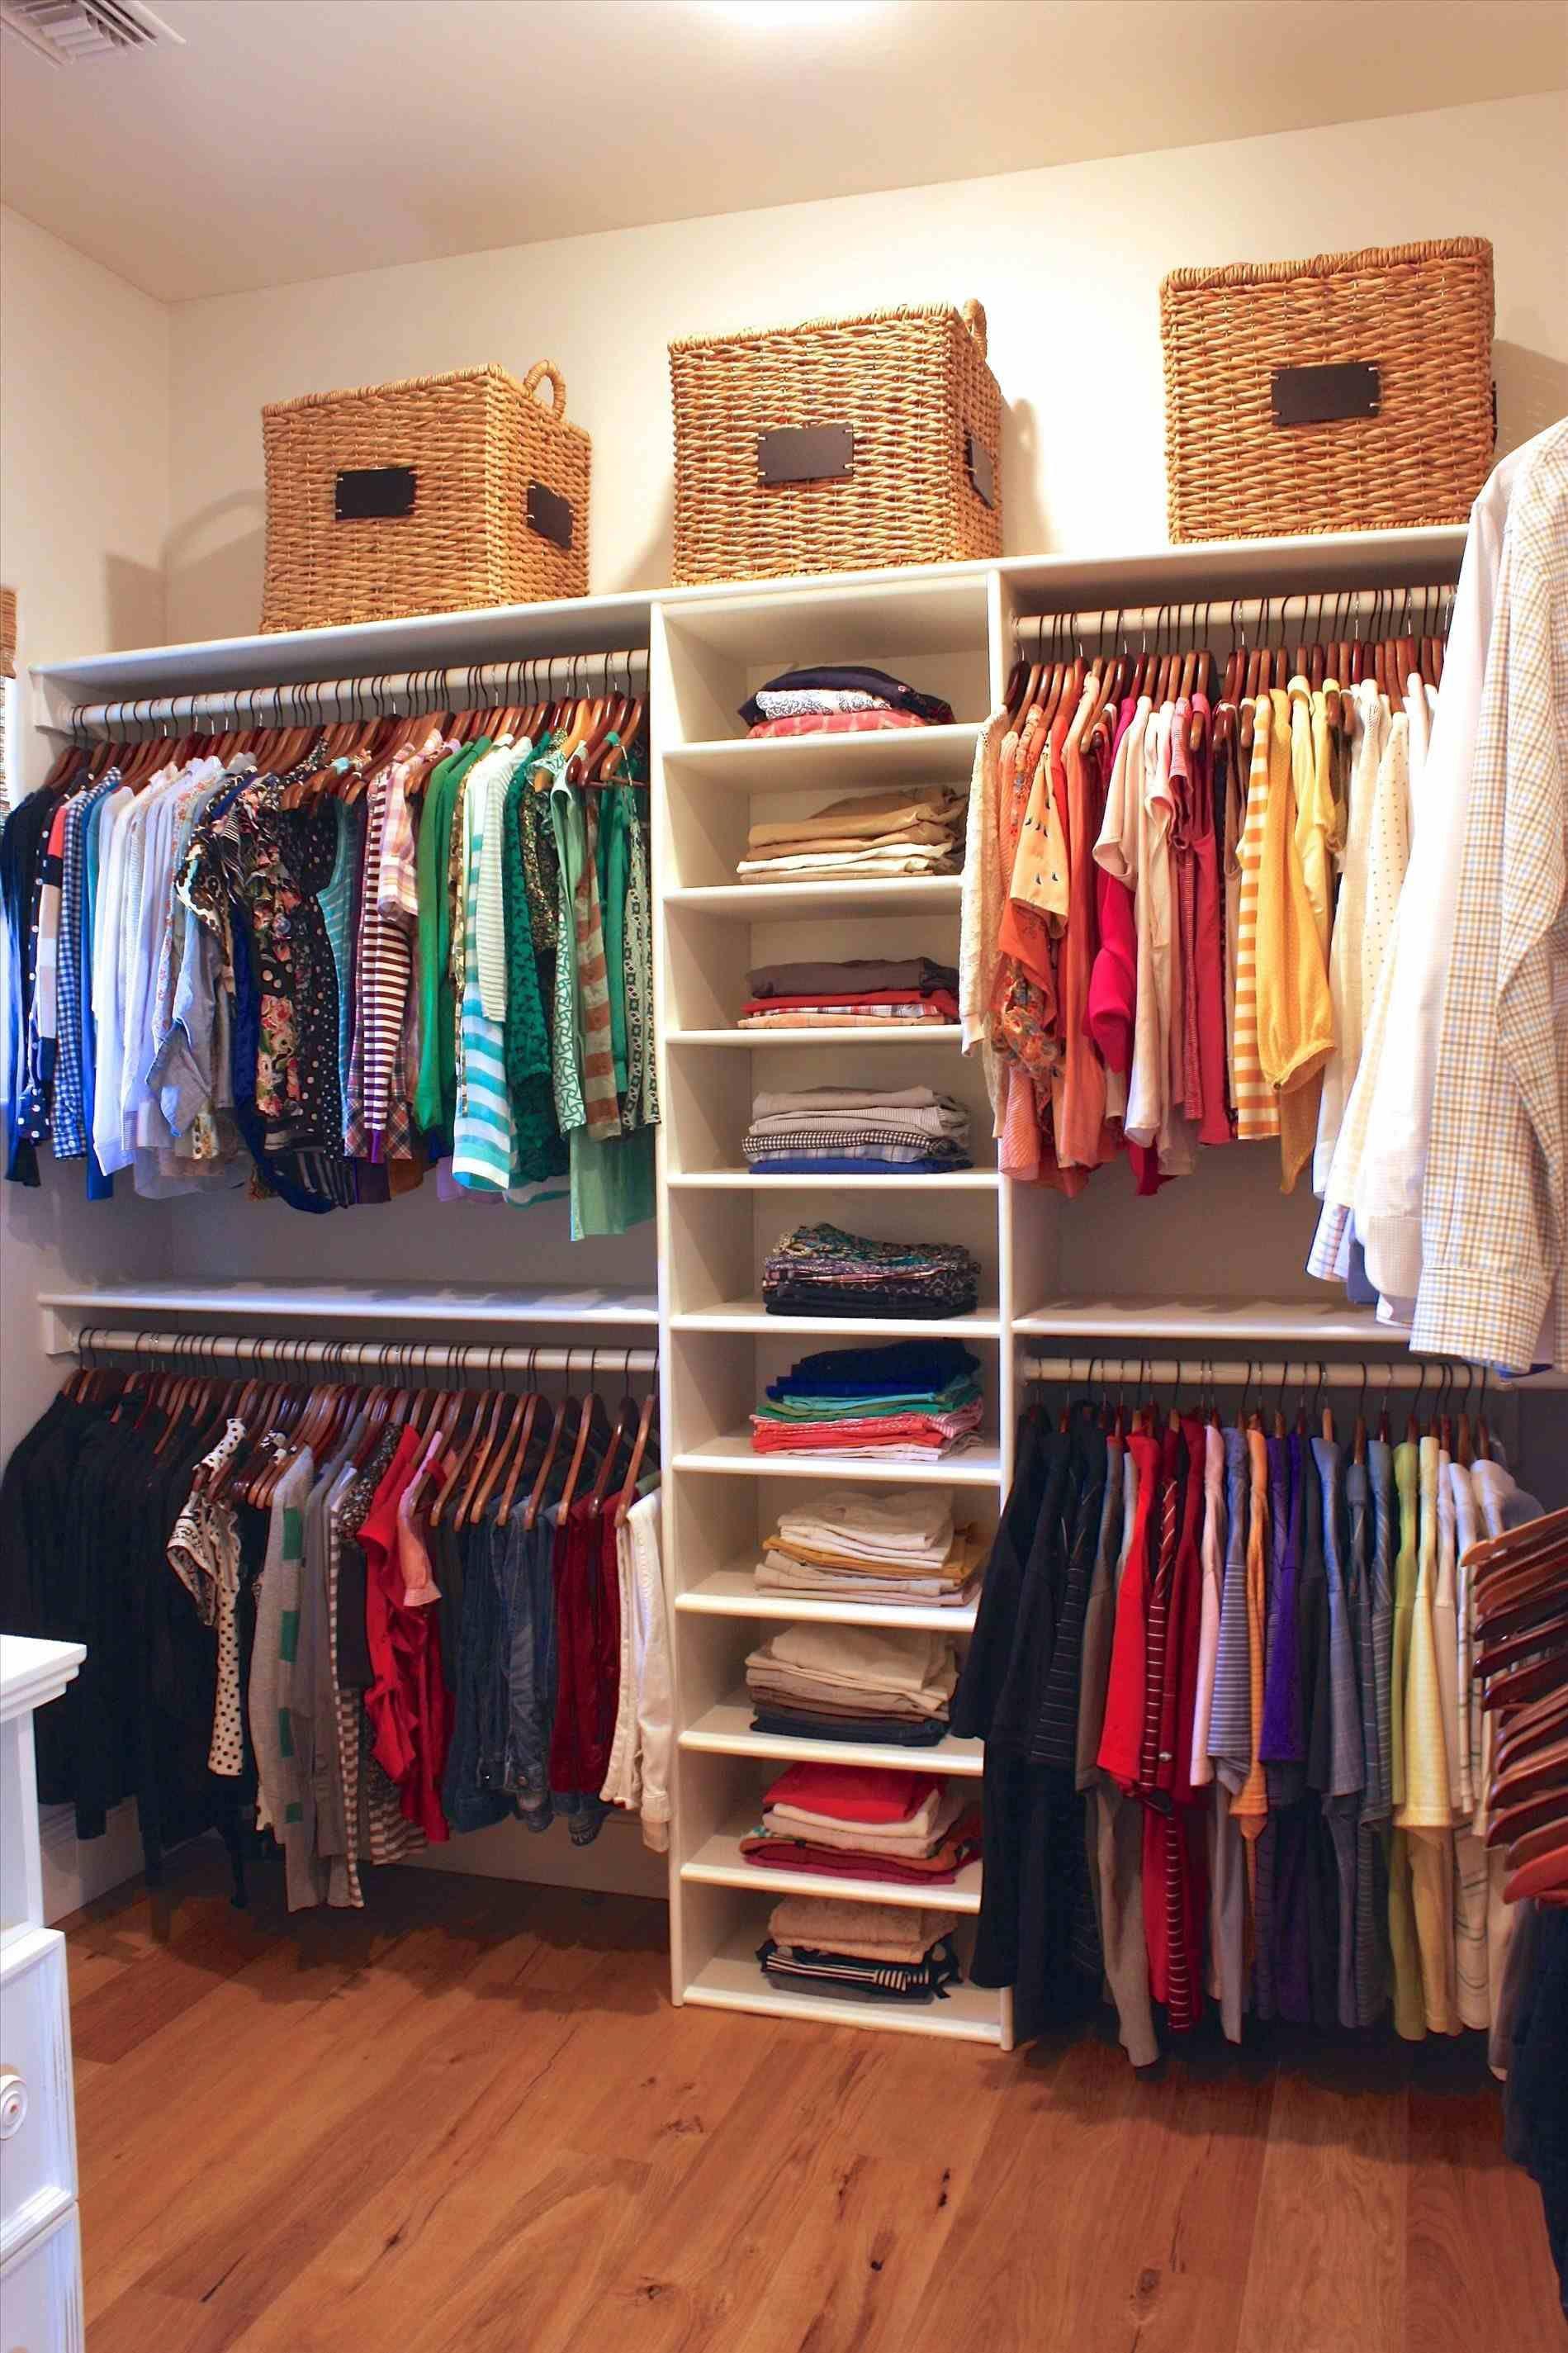 Master Bedroom Closet Design Ideas Bedroom Organization Closet Bedroom Storage Ideas For Clothes Diy Storage Ideas For Small Bedrooms